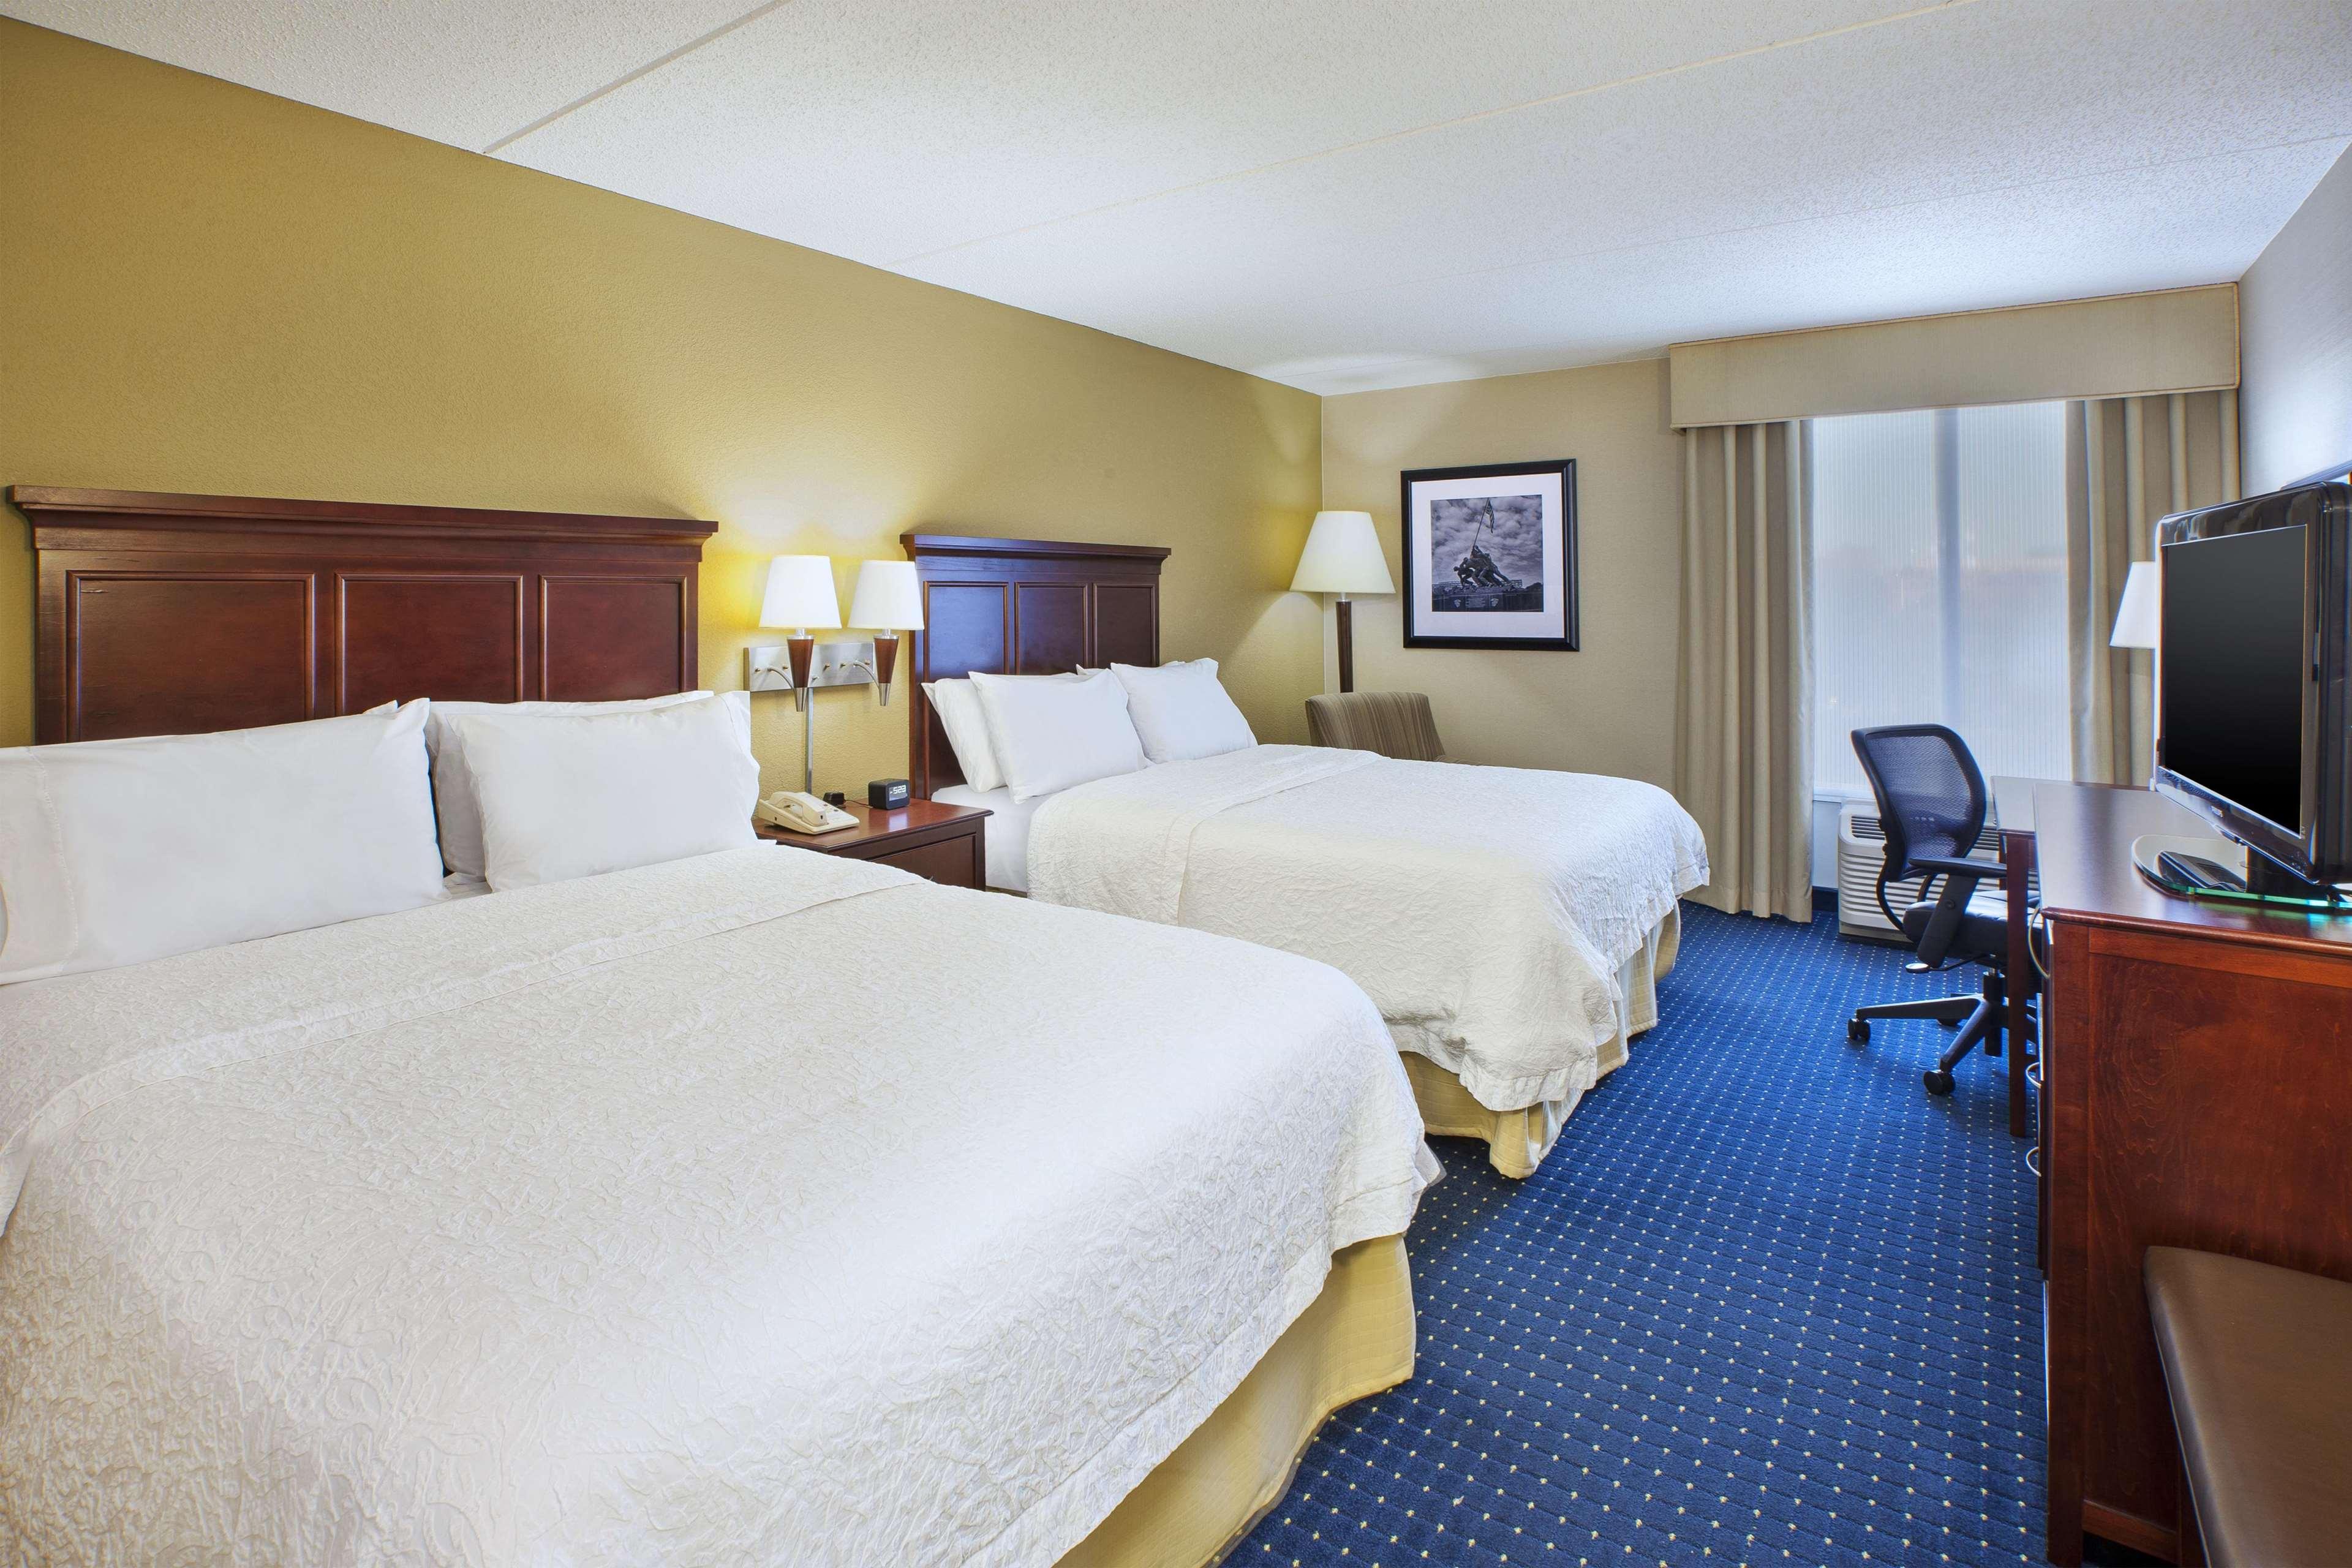 Hampton Inn Dulles/Cascades image 18